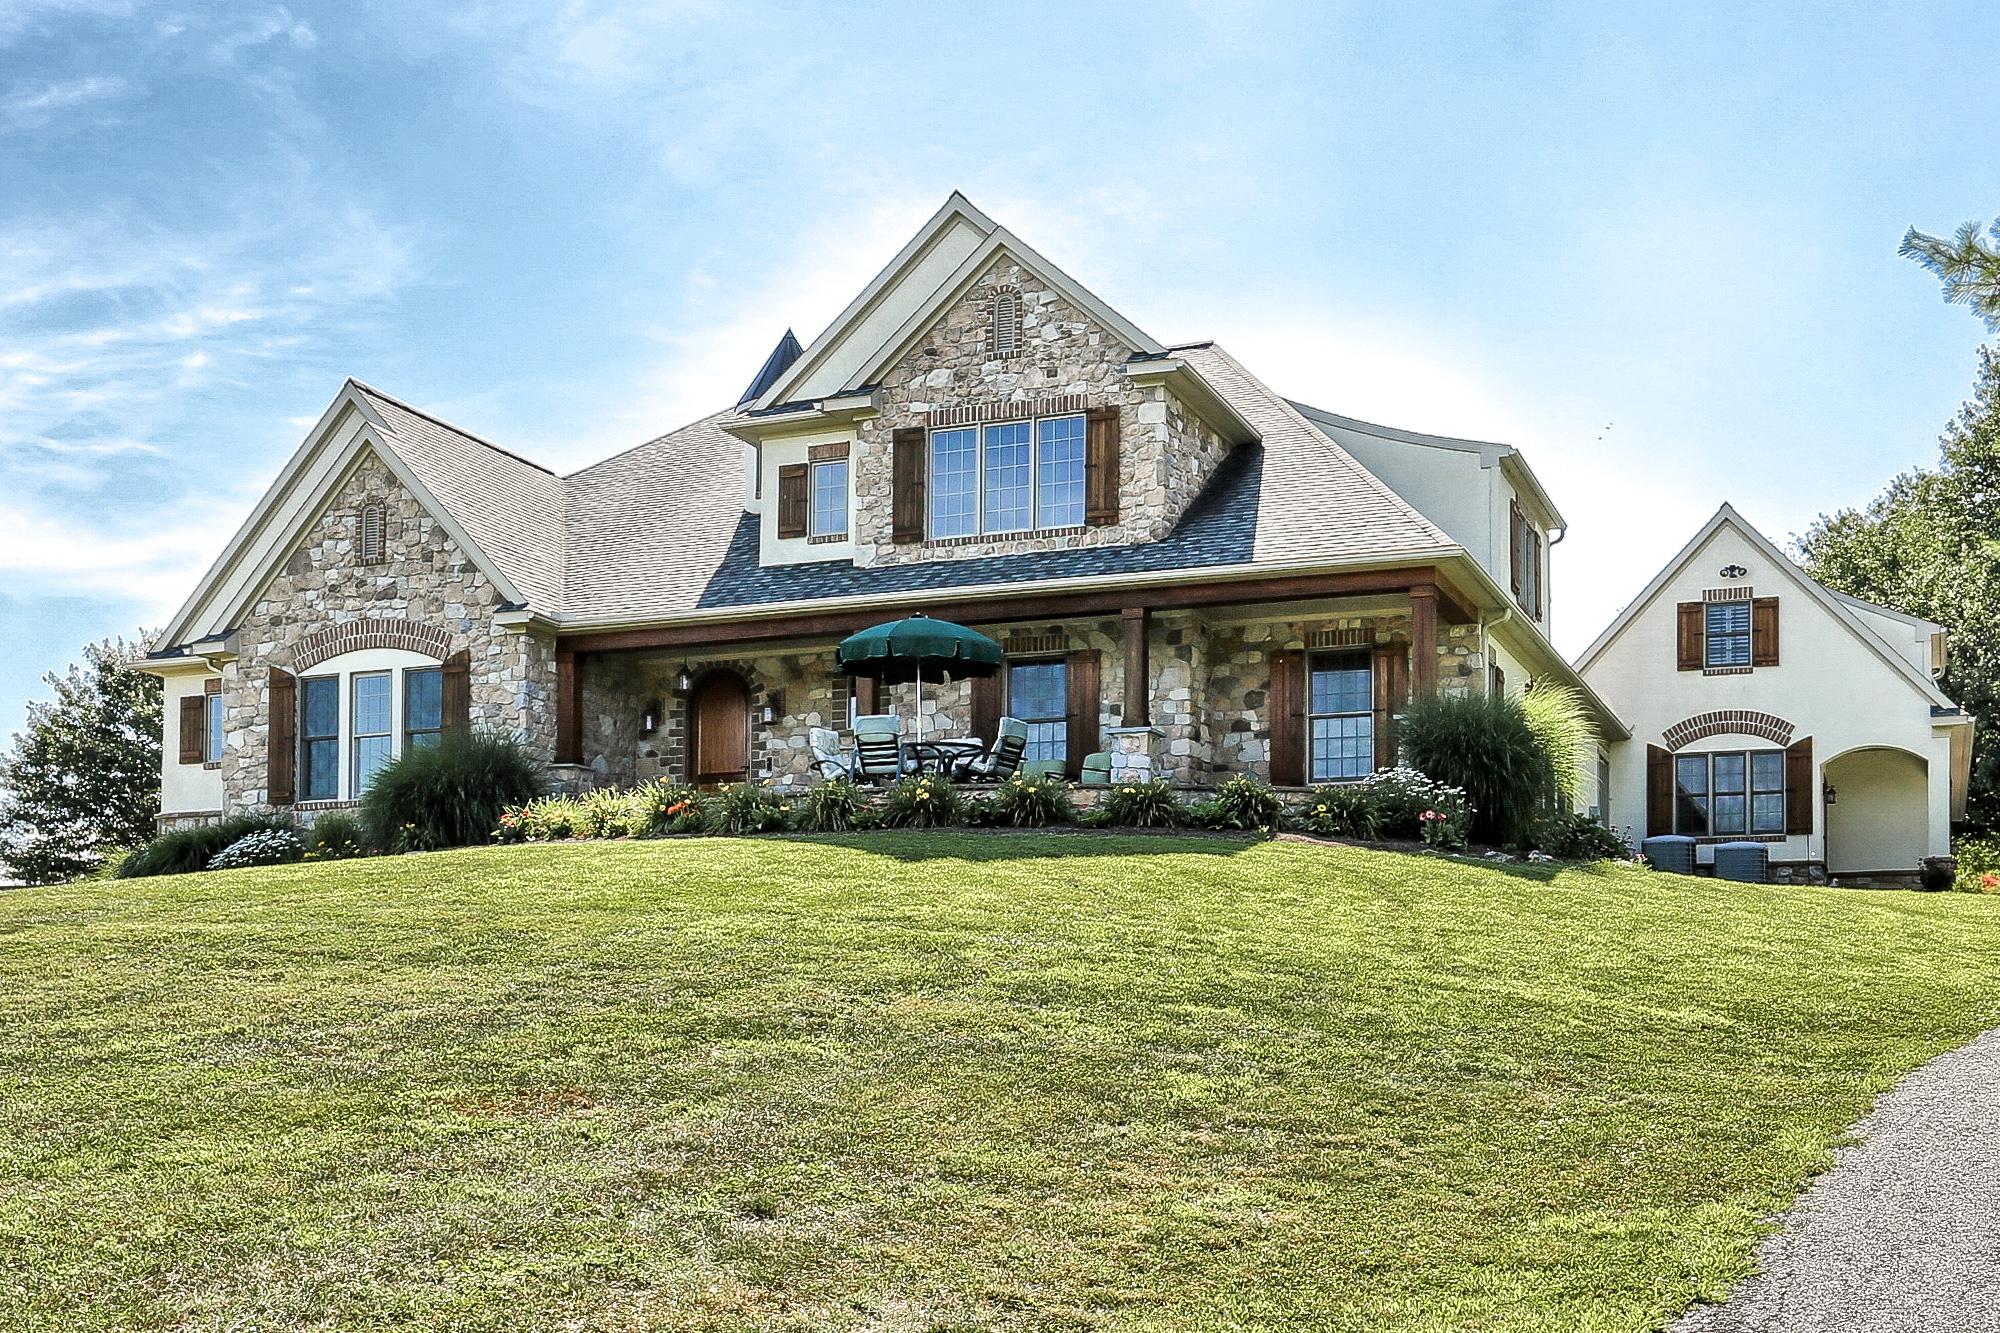 Farm / Ranch / Plantation for Sale at 380 Rineer Road Conestoga, Pennsylvania 17516 United States